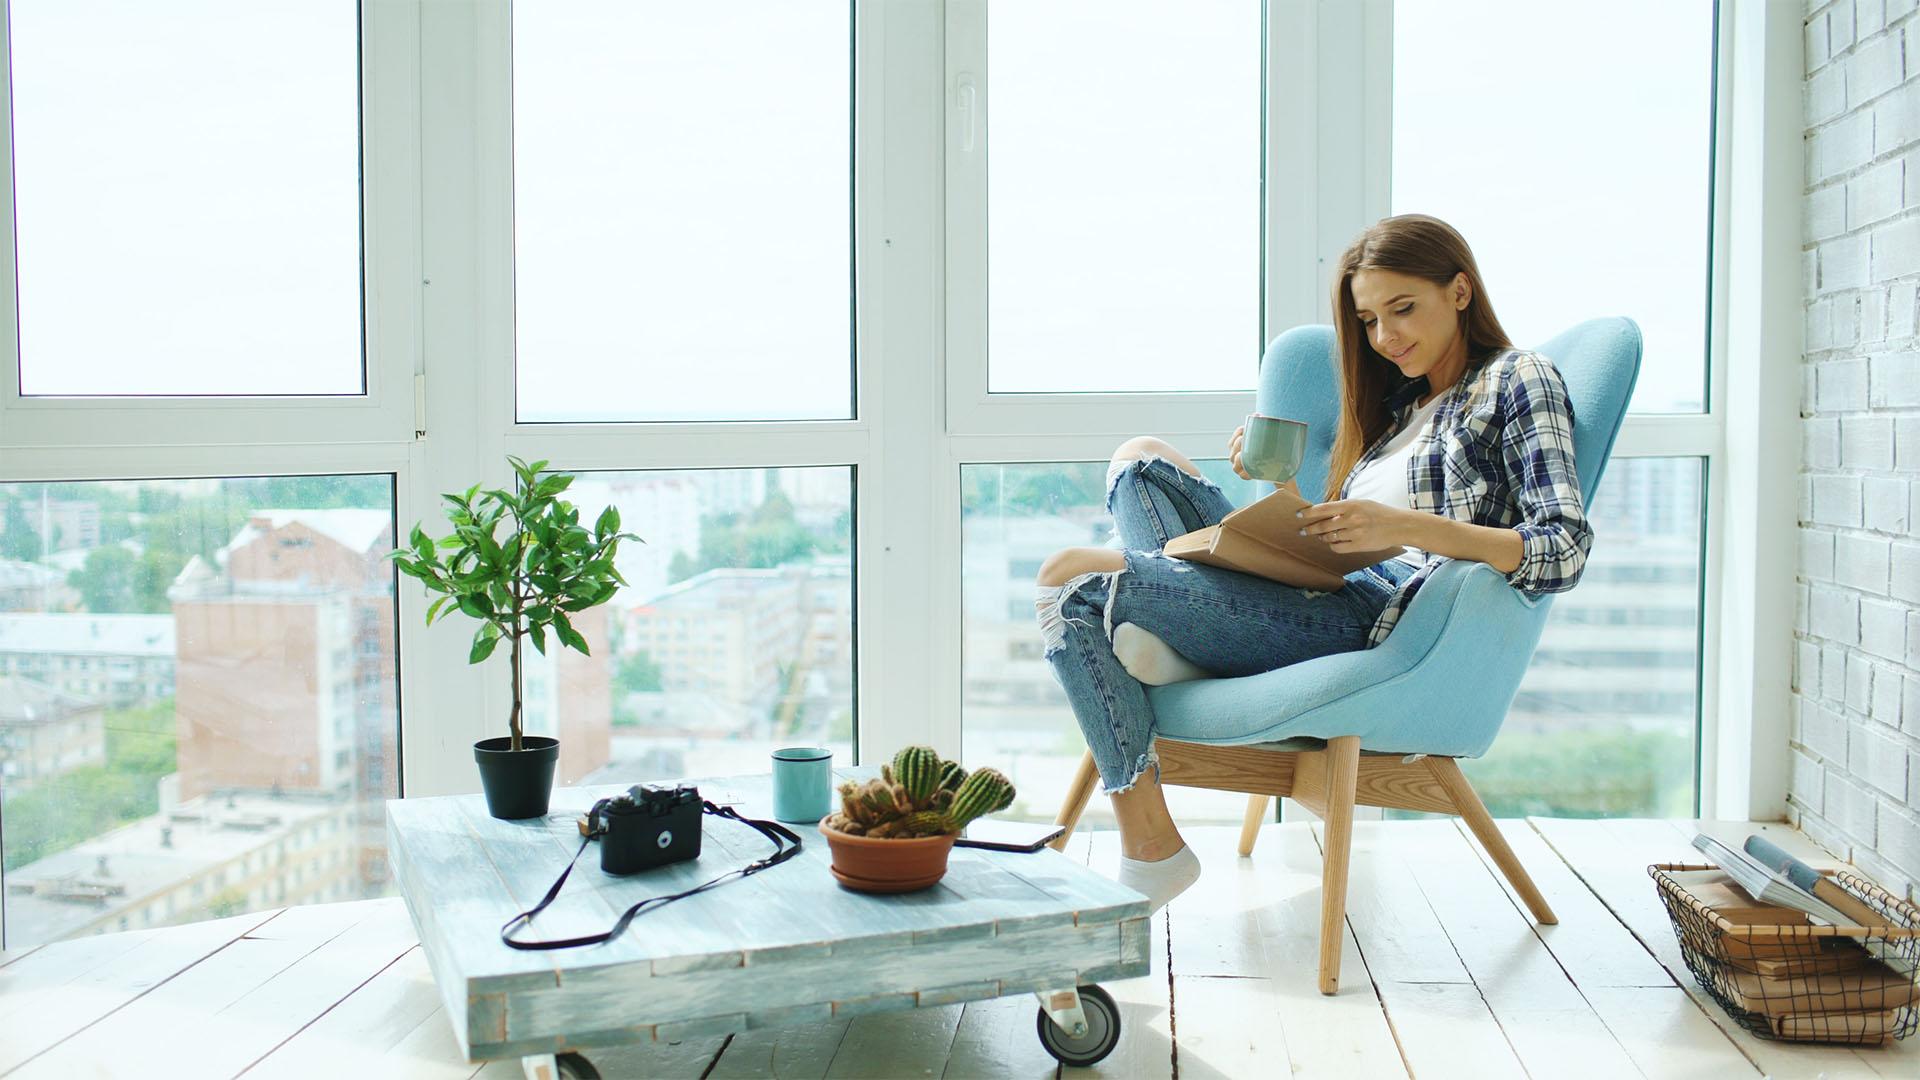 Frau liest in Lesesessel ein Buch